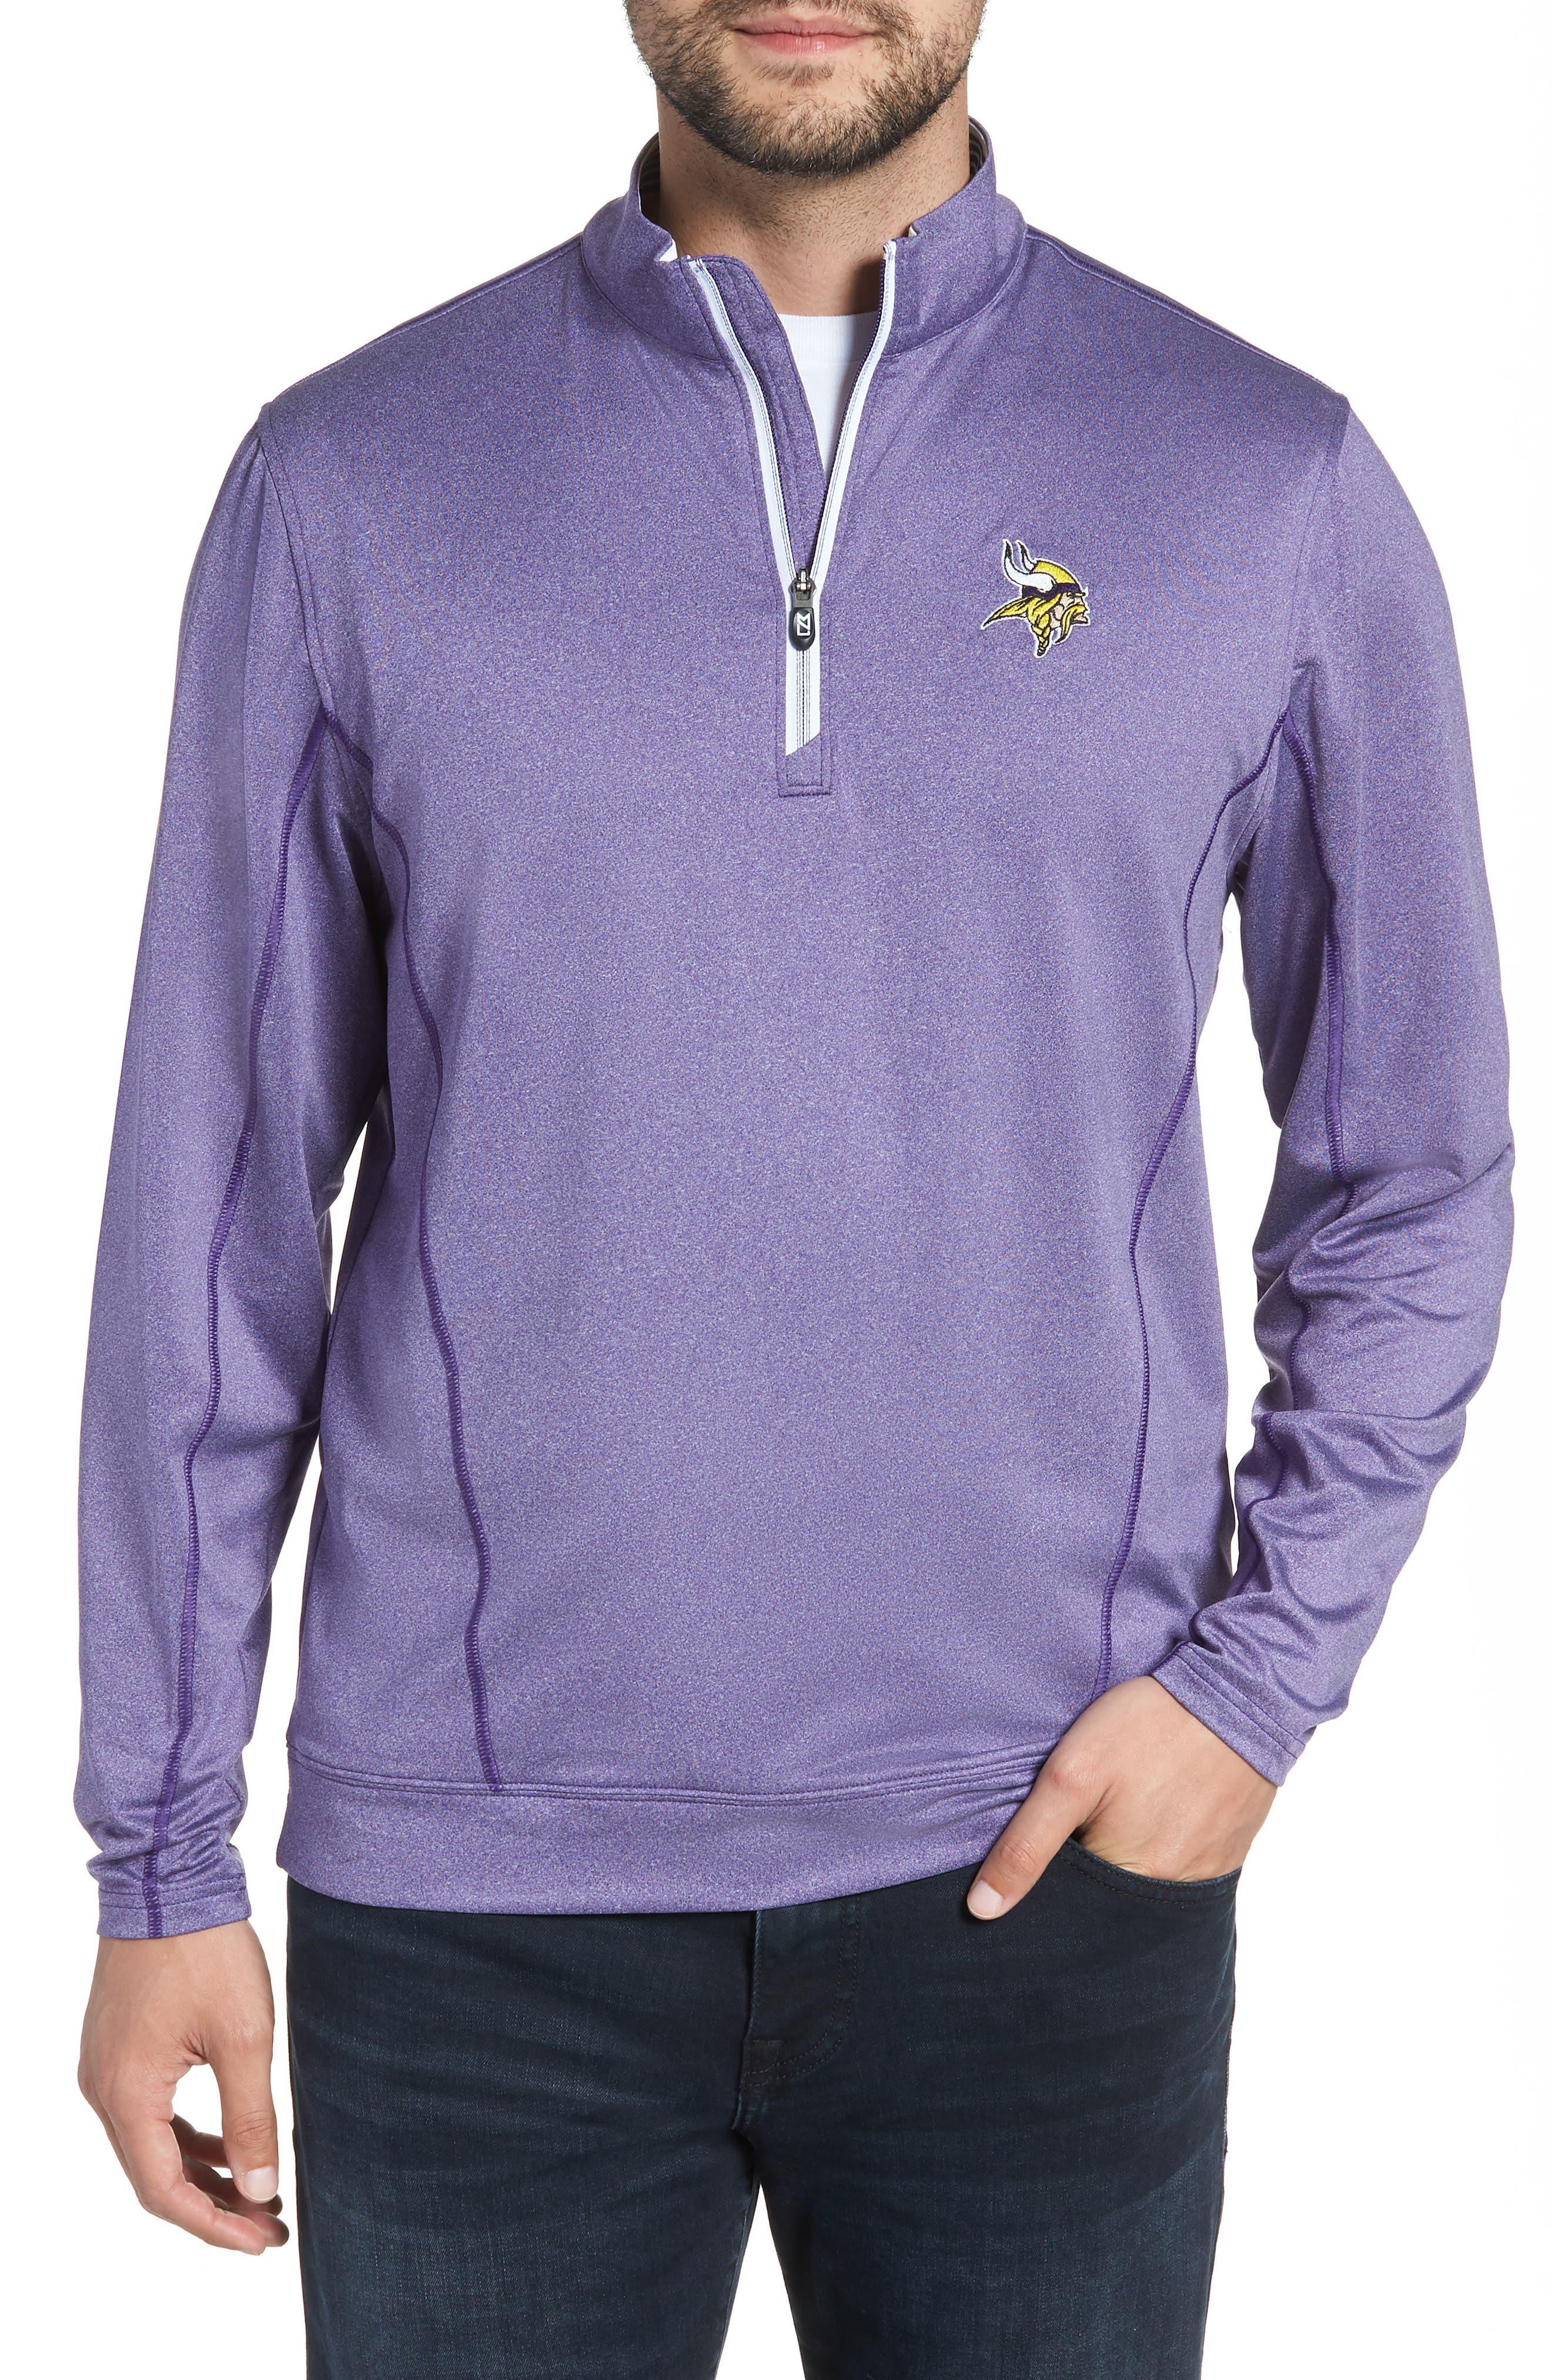 Endurance Minnesota Vikings Regular Fit Pullover,                             Main thumbnail 1, color,                             COLLEGE PURPLE HEATHER